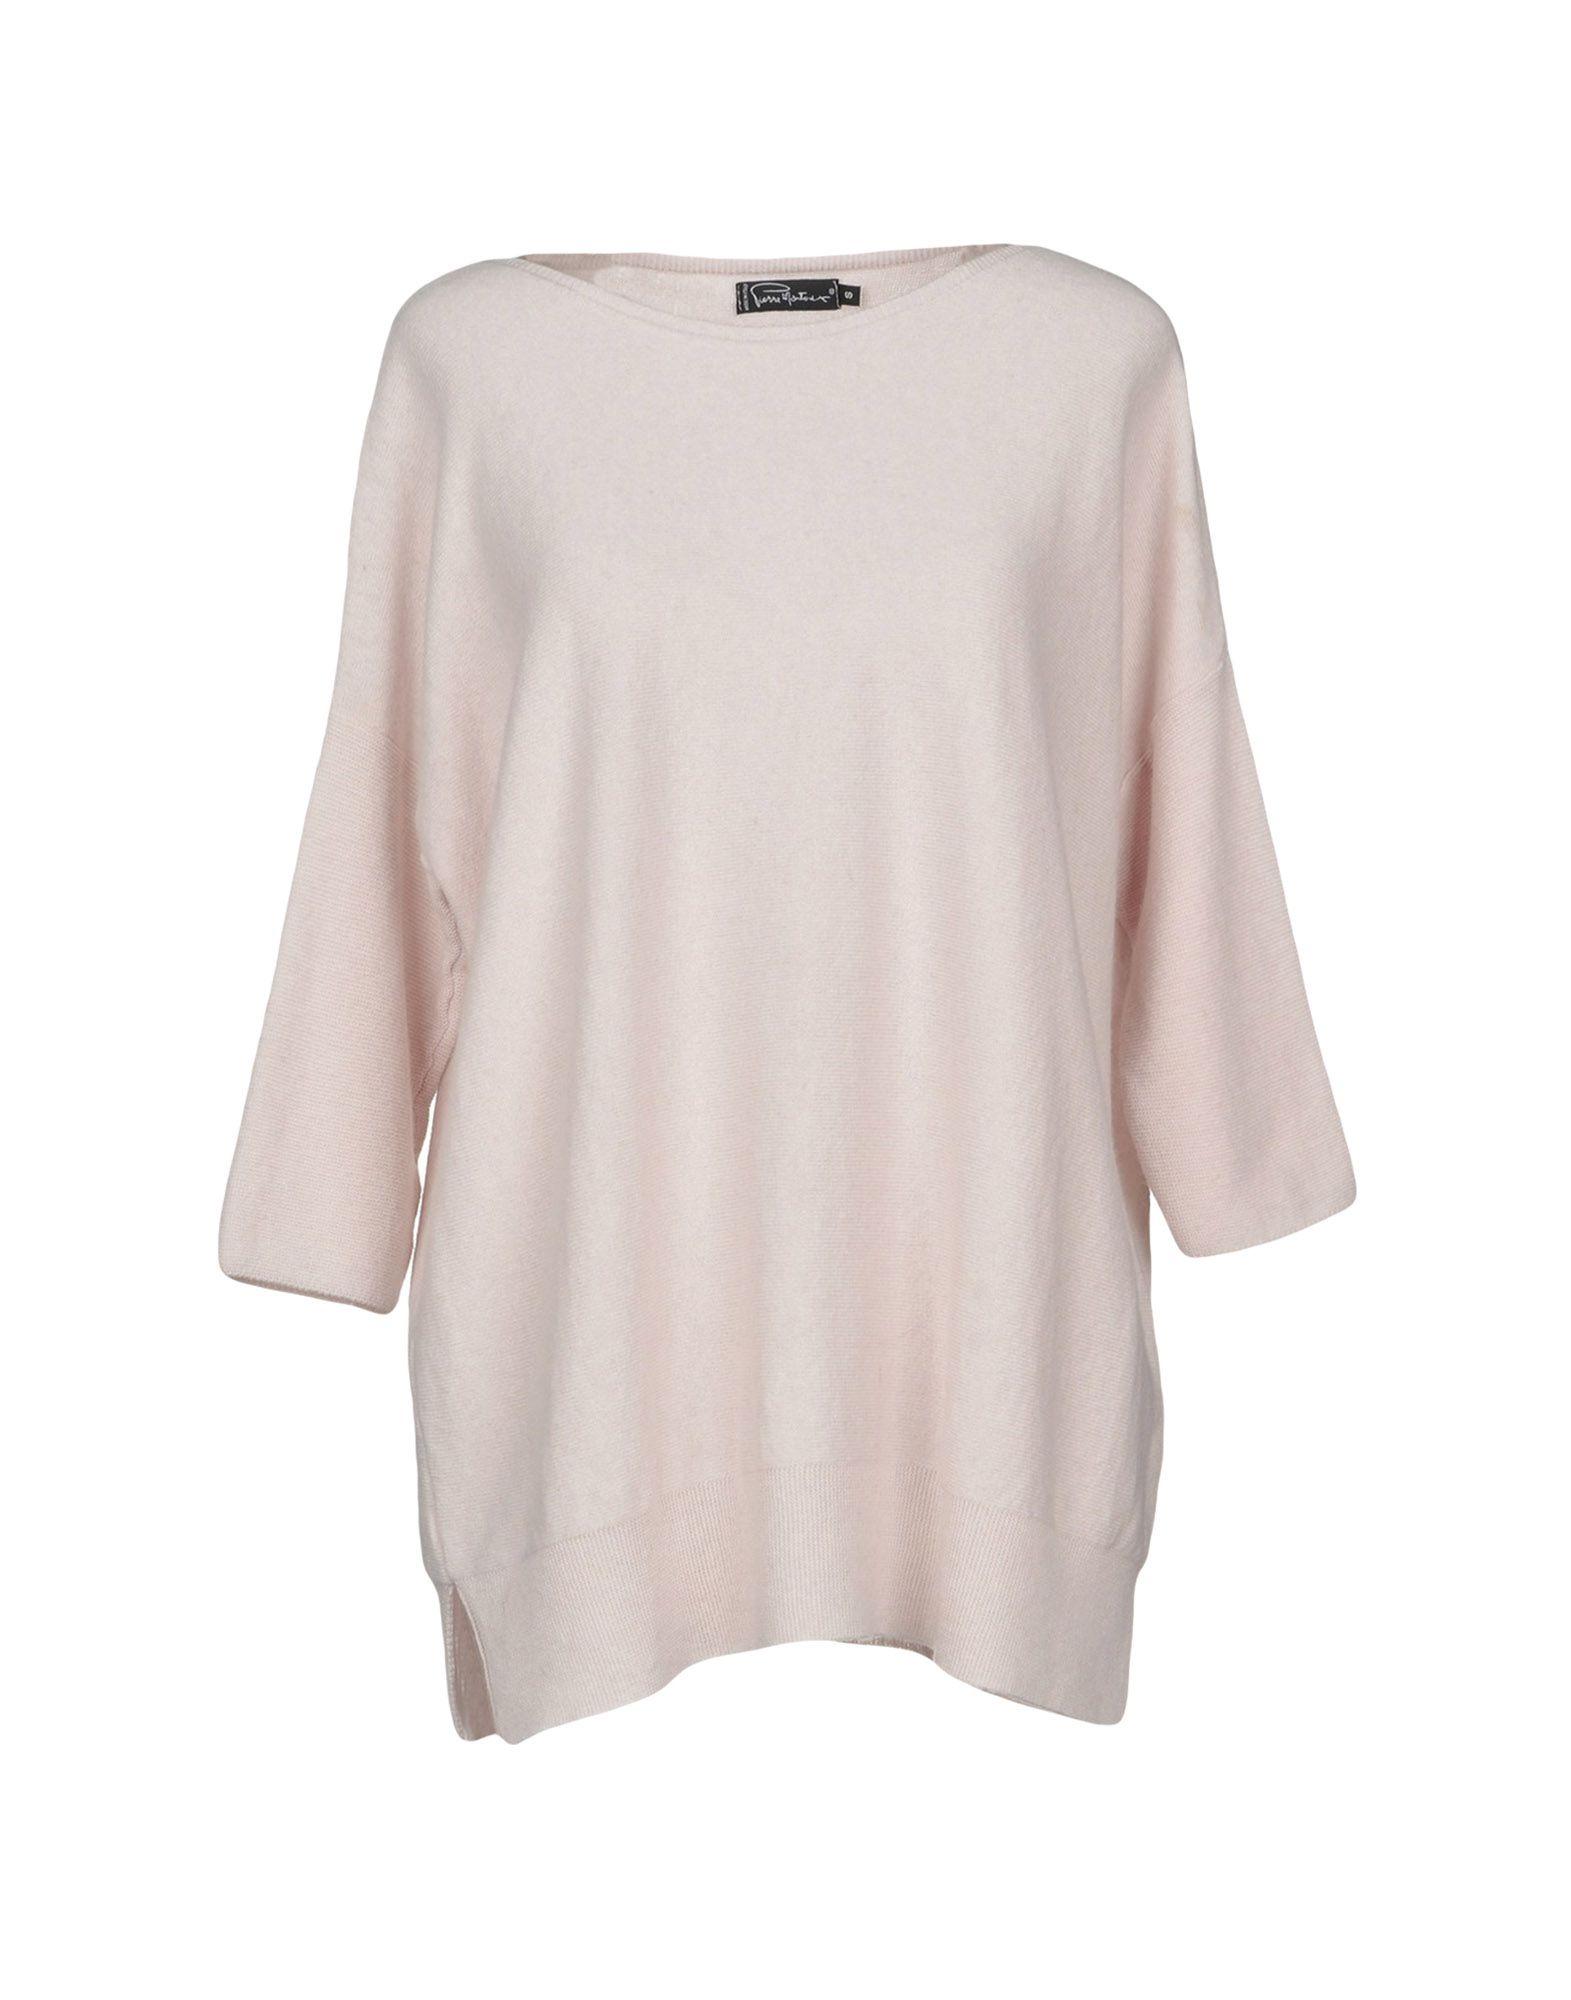 PIERRE MANTOUX Sweater in Light Pink